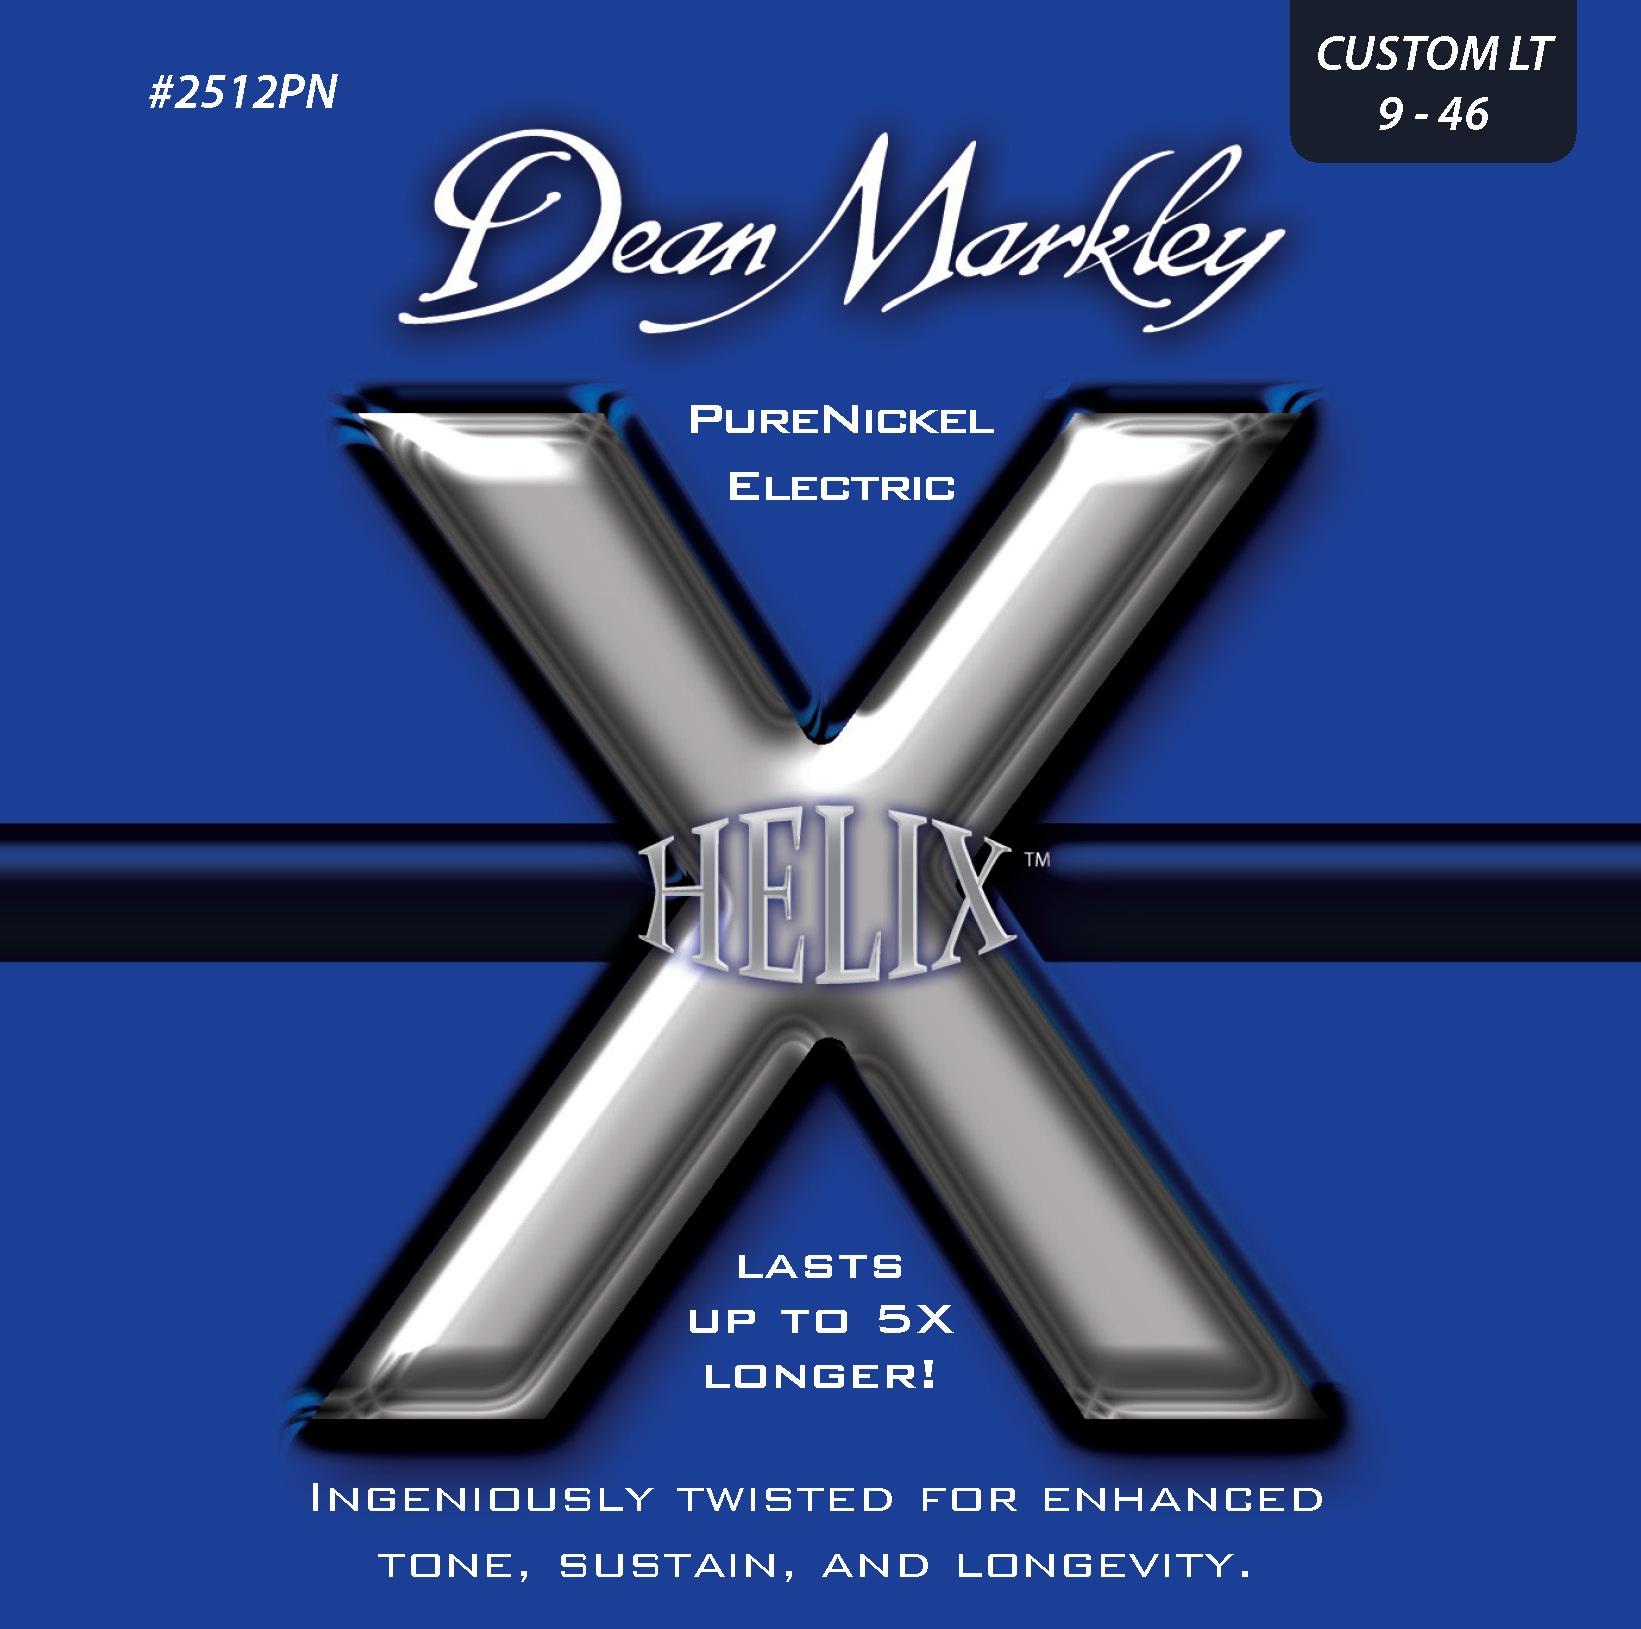 Dean Markley 2512PN CL 9-46 Helix PureNickel